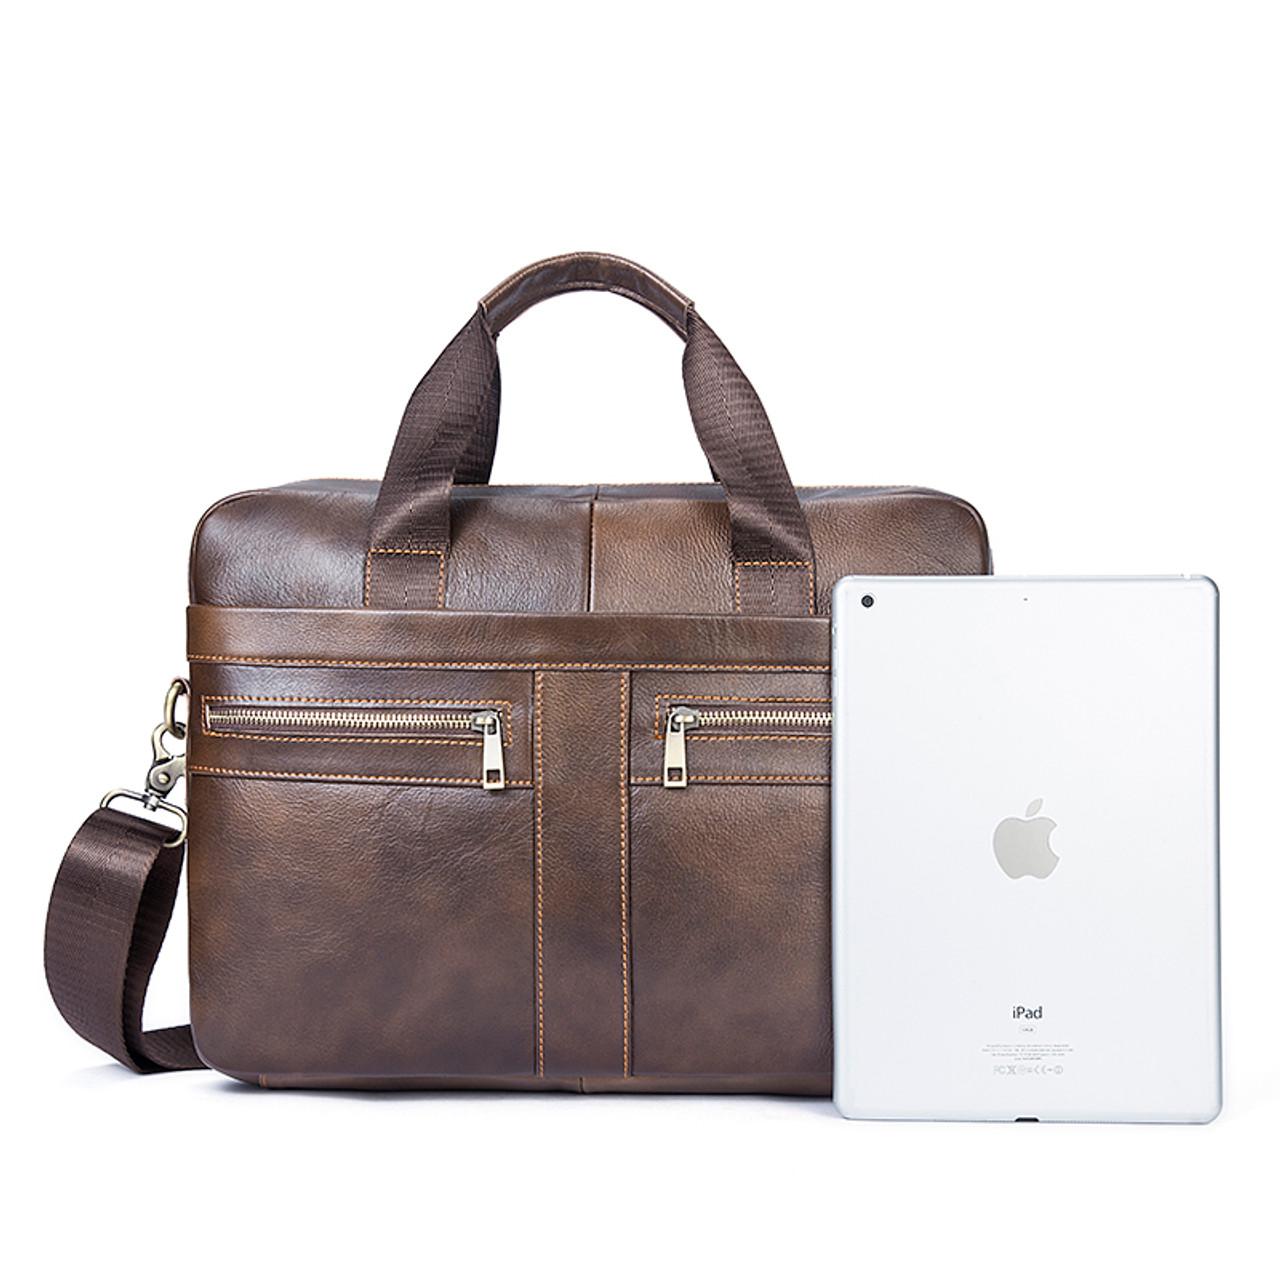 46441f8d6d ... WESTAL Genuine Leather Men Bags Briefcases Men s Messenger Bag Cowhide  Leather Laptop Crossbody Handbag Male Business ...